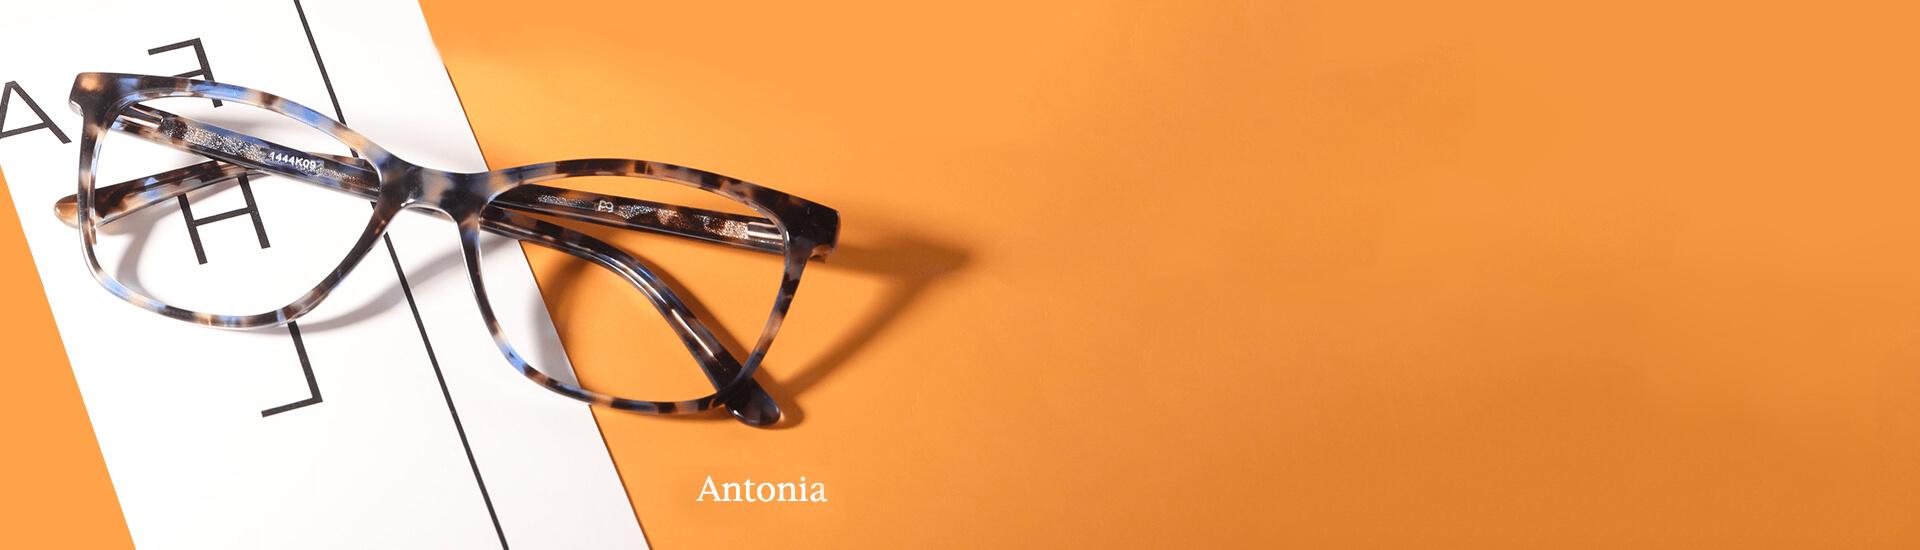 The Best Place to Buy Prescription Eyeglasses Online